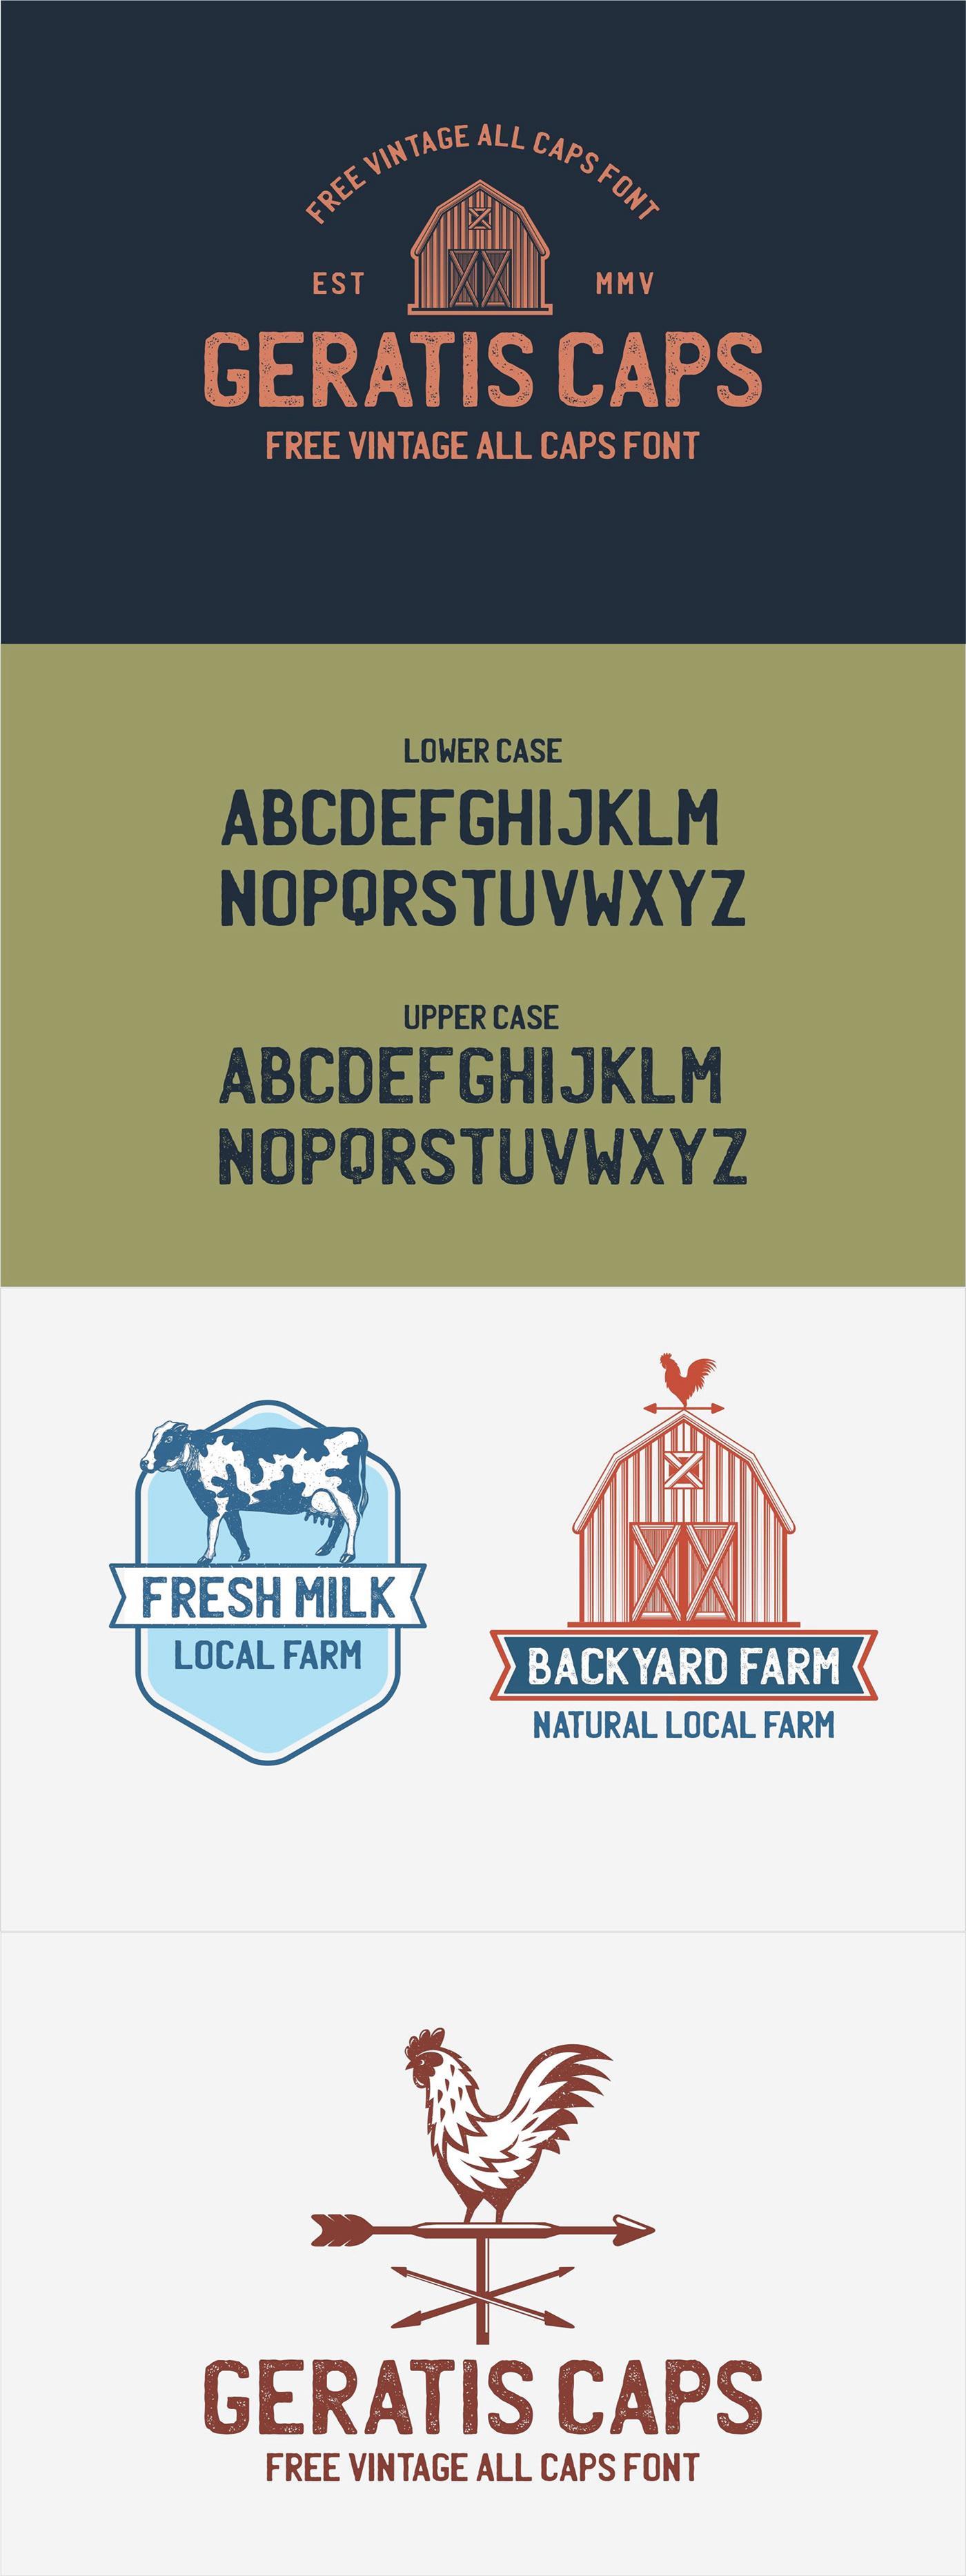 free Free font type Typeface vintage texture all caps Display branding  logo